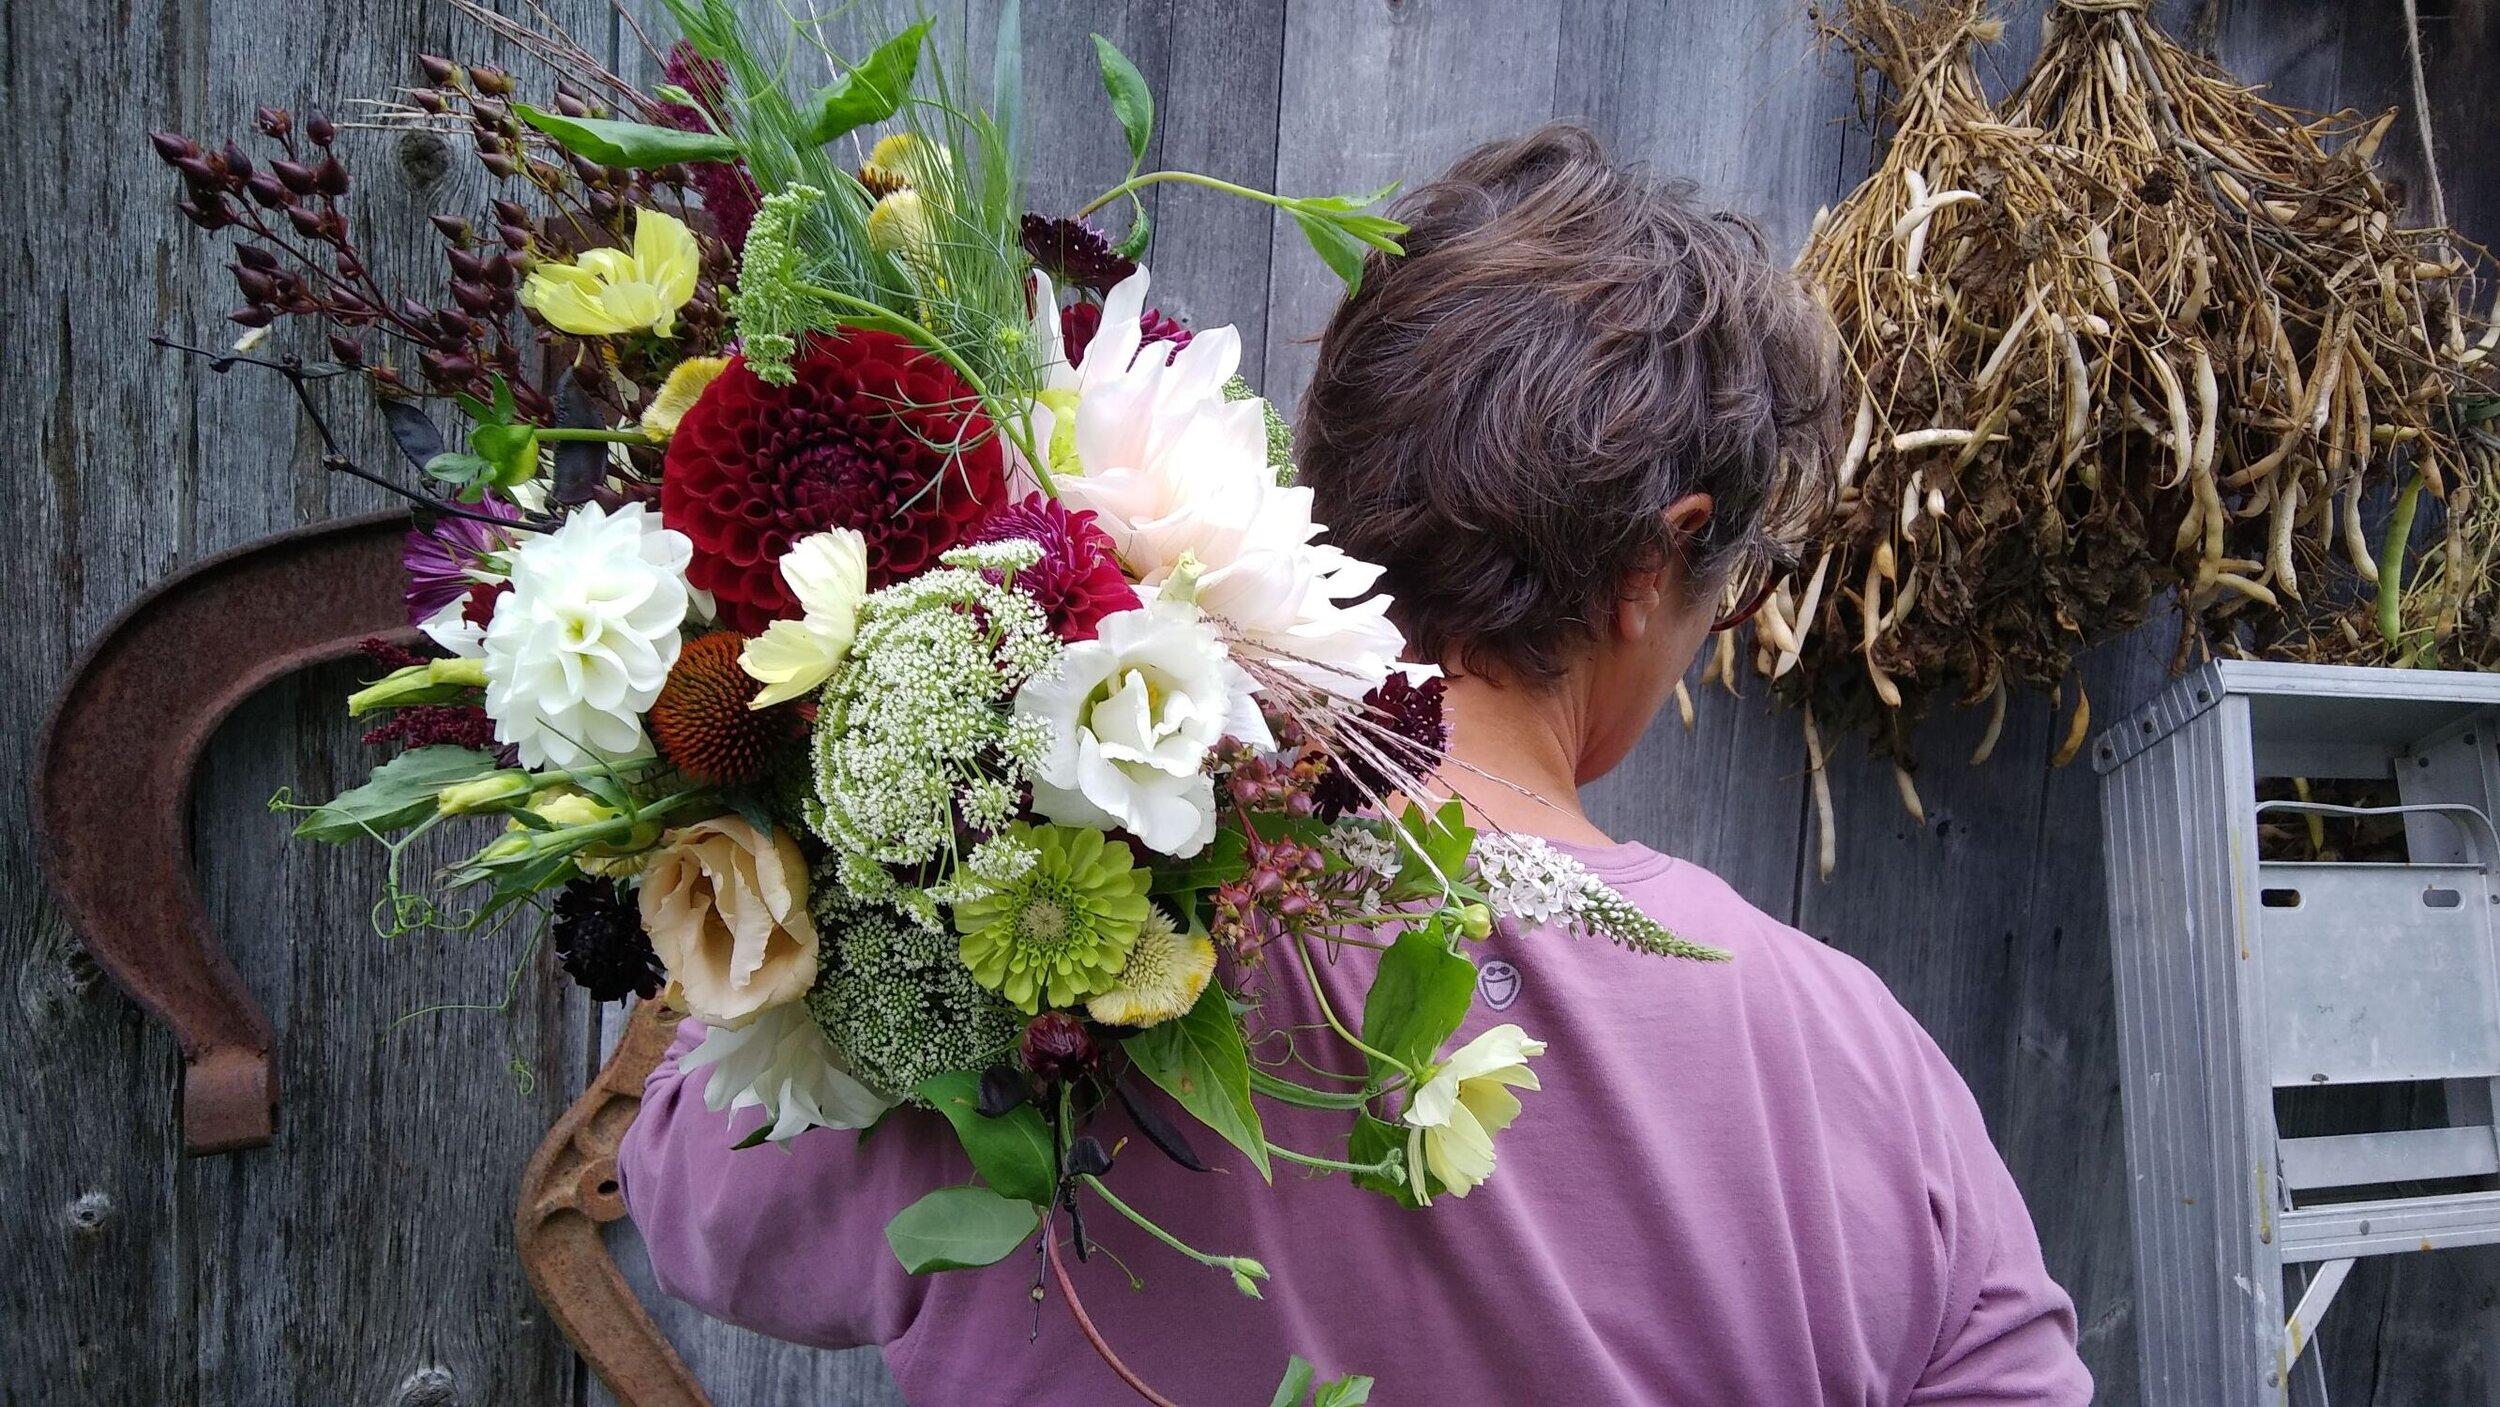 Leah Briday Bouquet 9 - 14 - 19.jpg